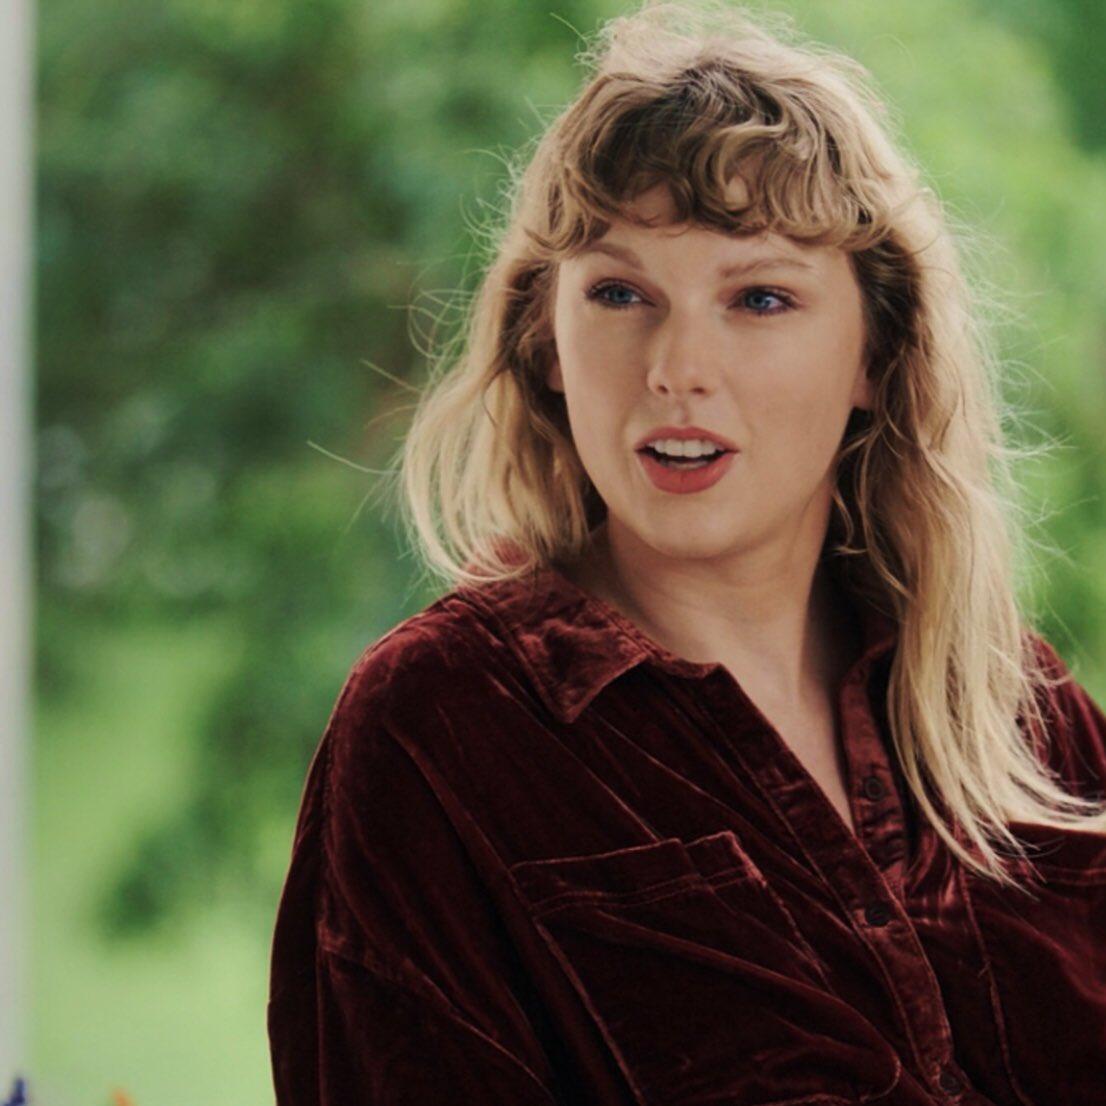 Taylor Swift is the second most streamed female artist of 2020 on Spotify so far with 4.9 BILLION streams. https://t.co/jxn3aJbsmE